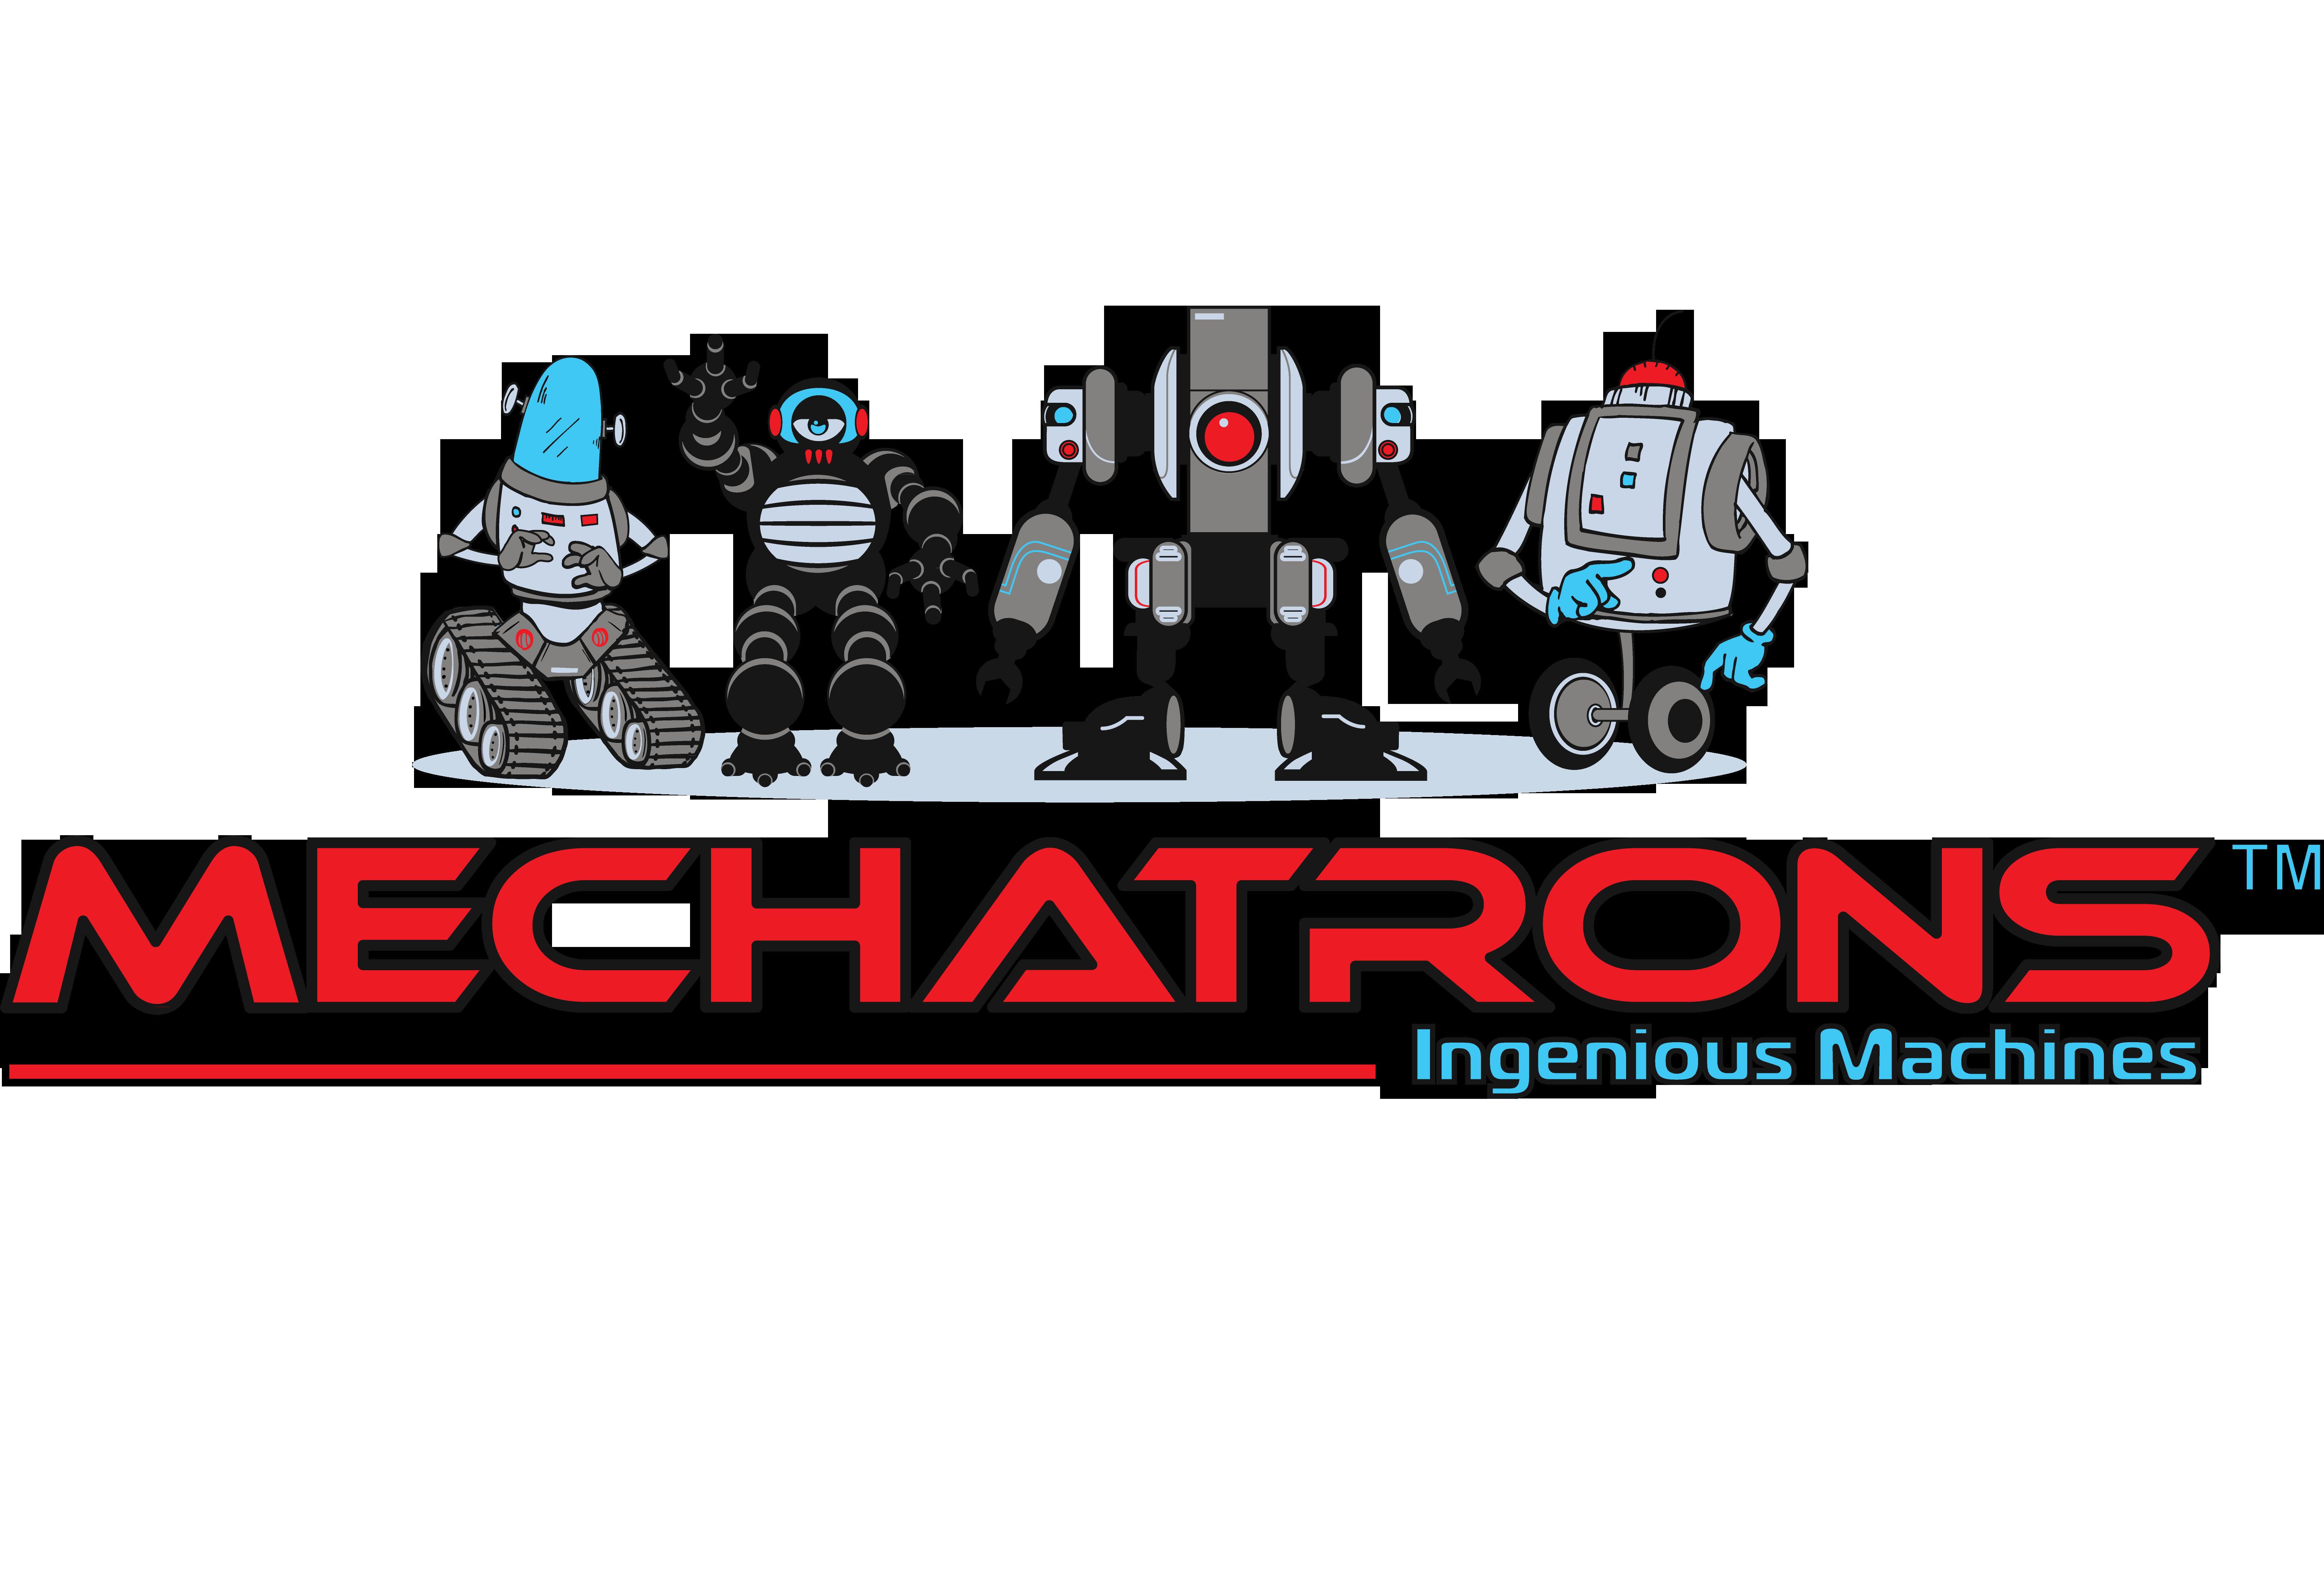 Mechatrons